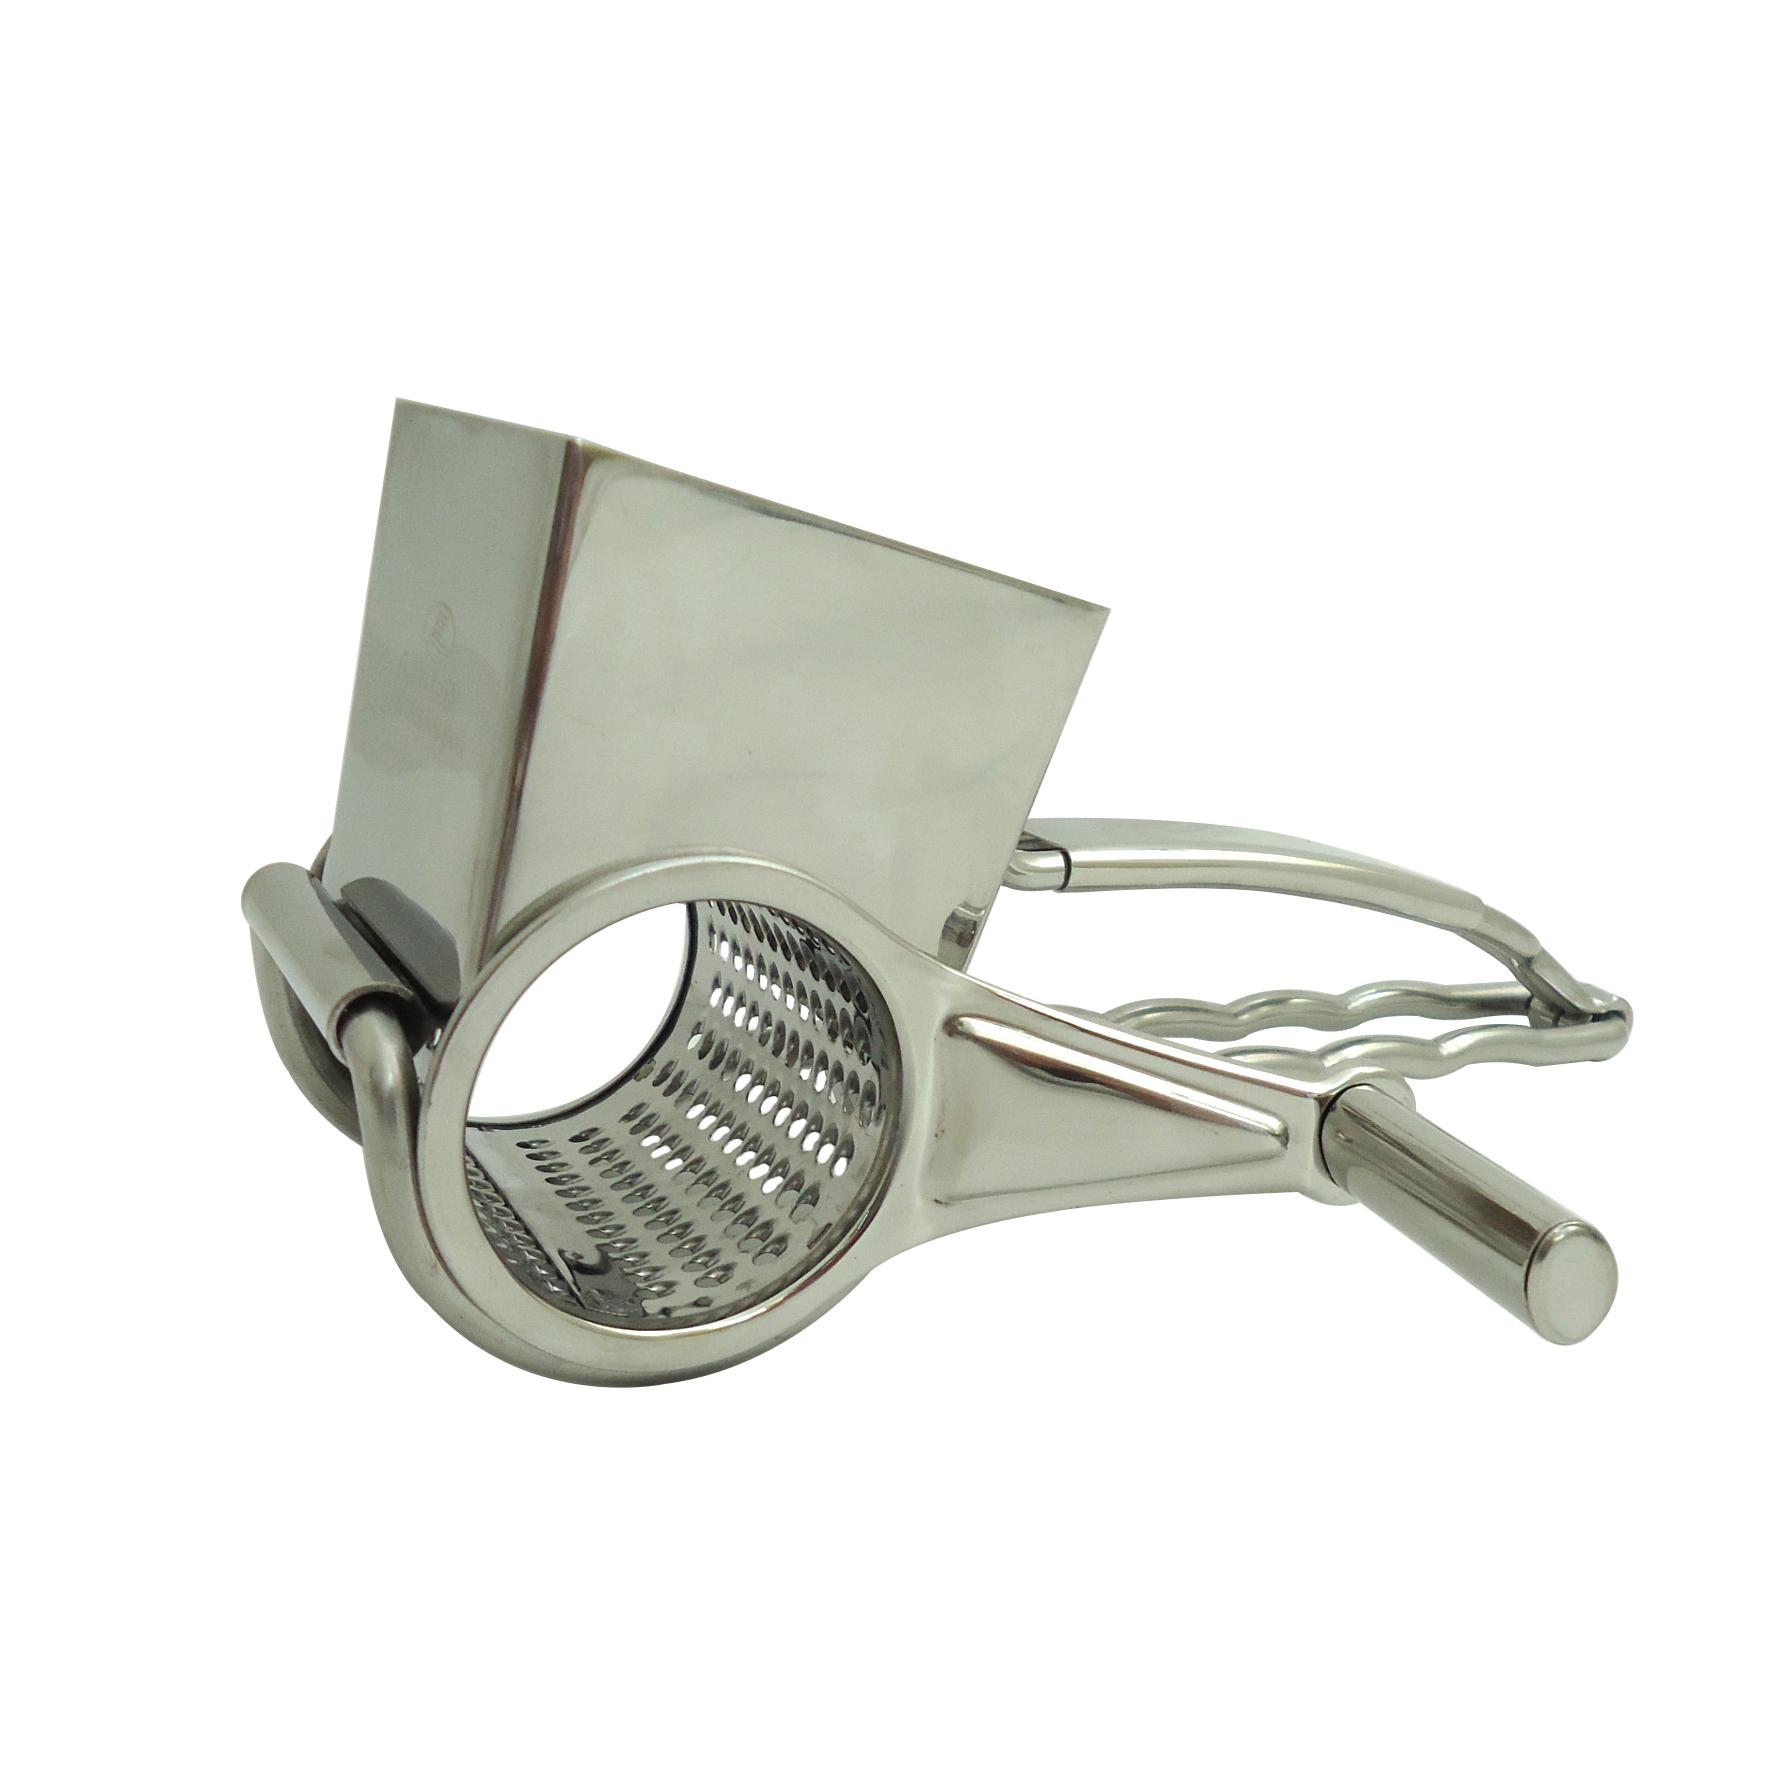 LACOR 60335 Τρίφτης Τυριού με 2 Μαχαίρια - Διαστάσεις: 135x200x100mm επαγγελματικός εξοπλισμός   επαγγελματικά σκεύη είδη σερβιρίσματος   εργαλεία κο